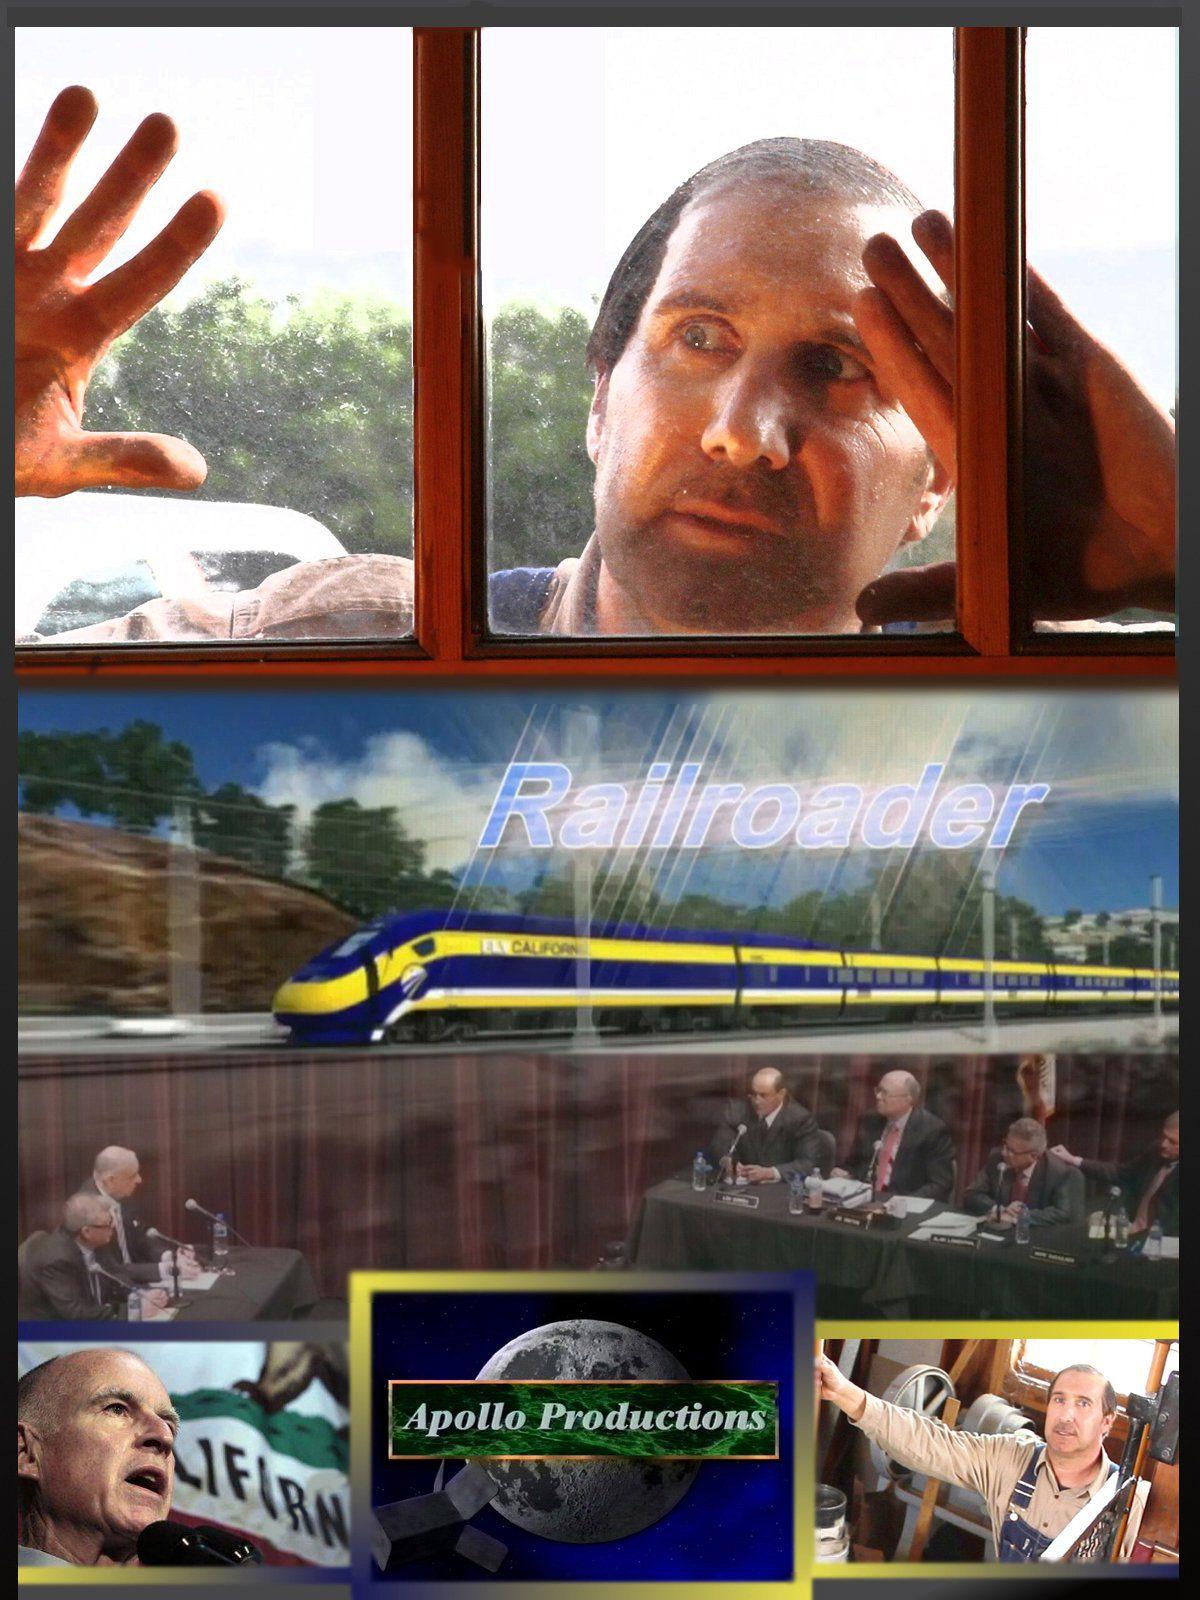 Railroader - Documentaire (2012)